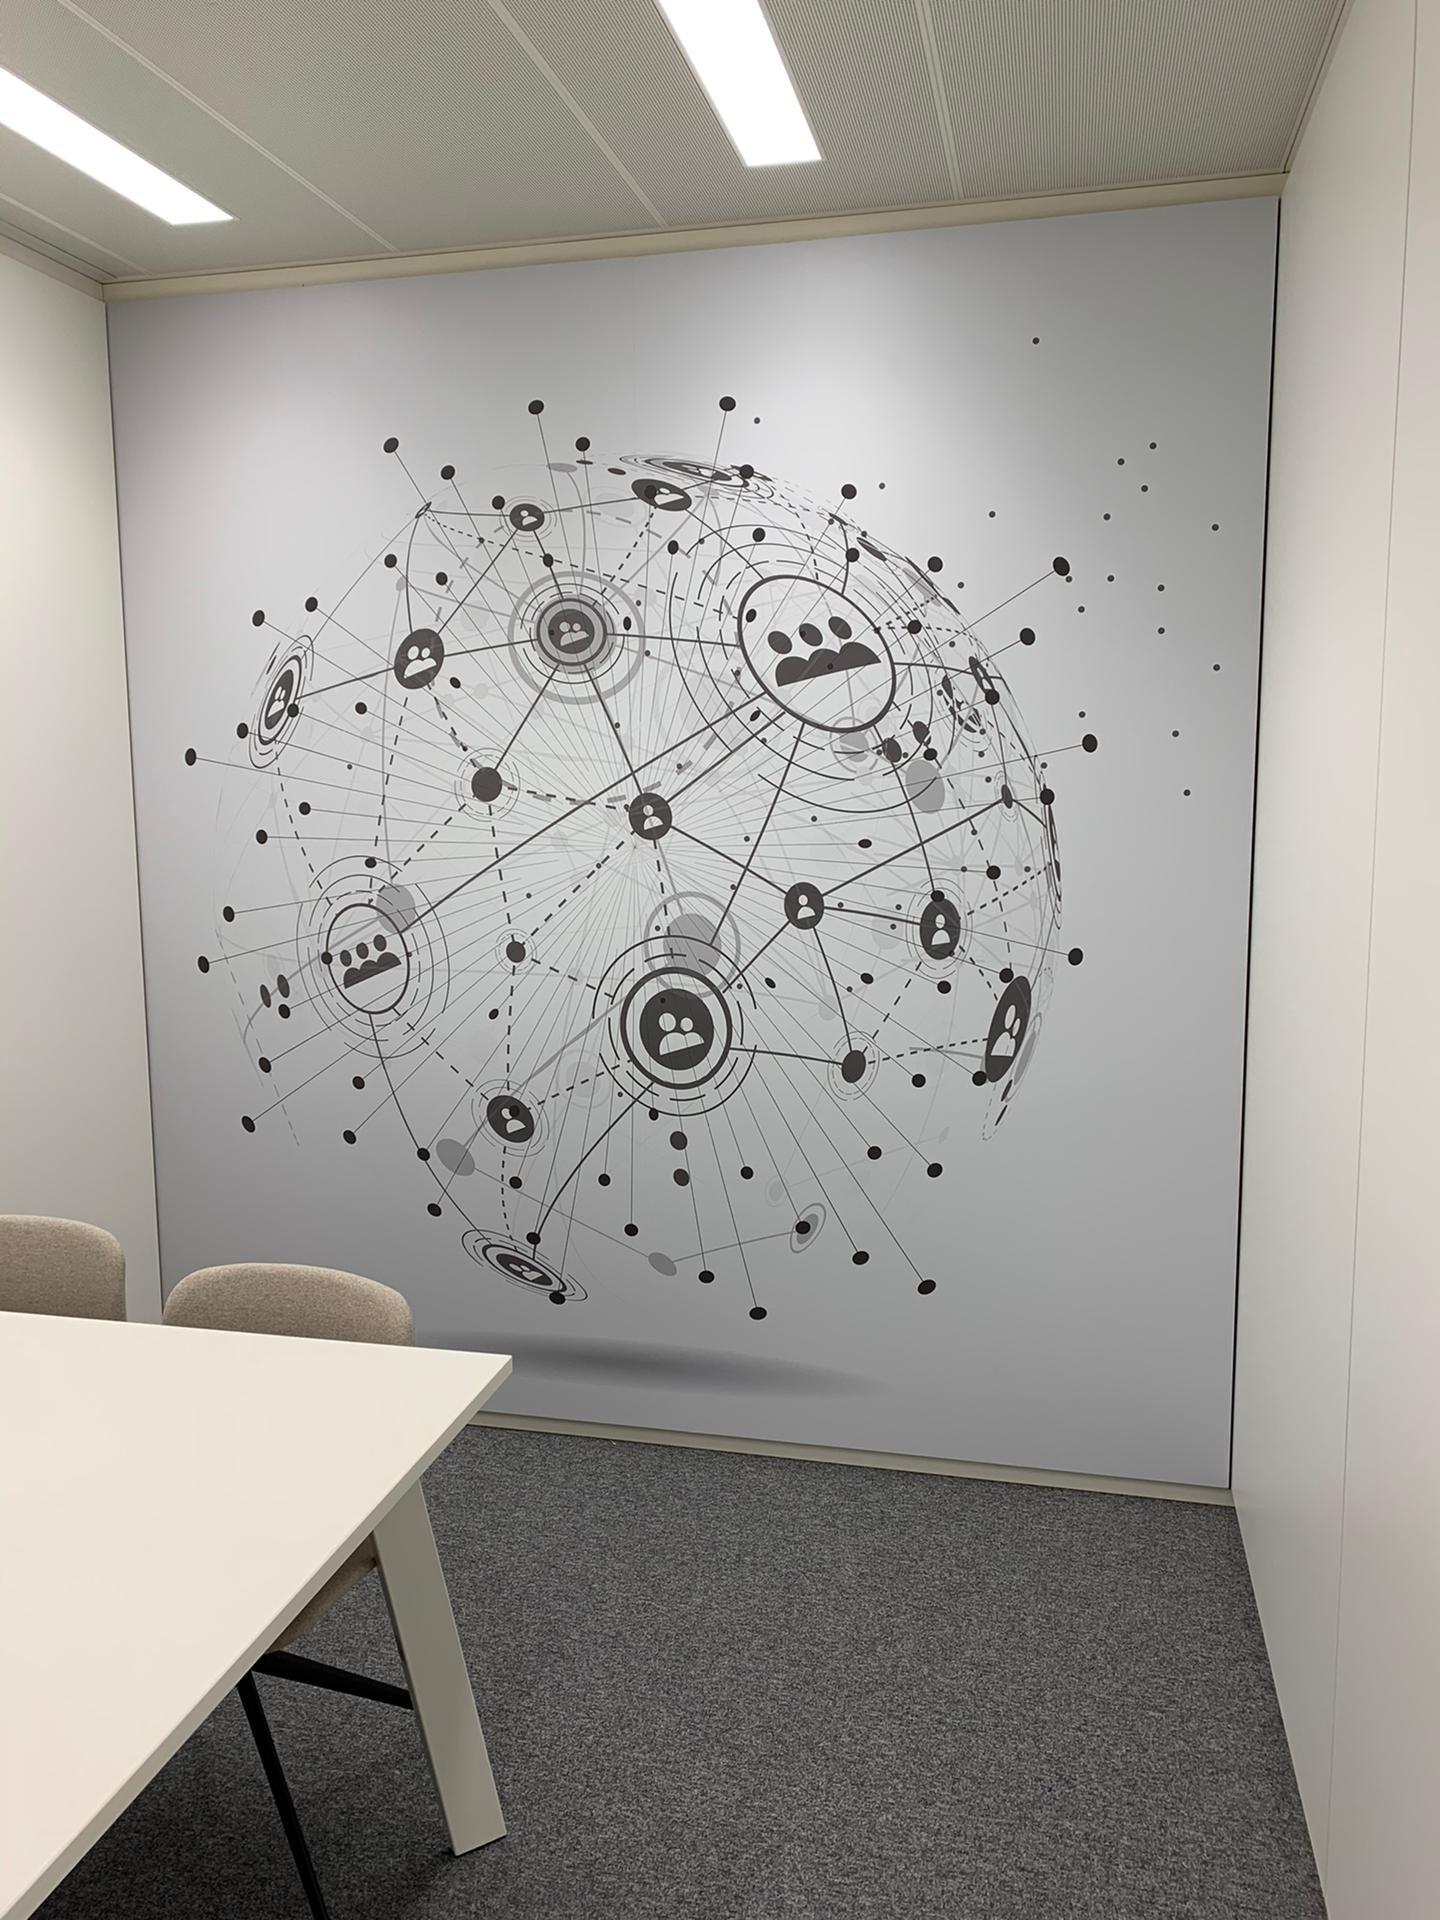 95.3_ctg wallpaper3_c&w design & build